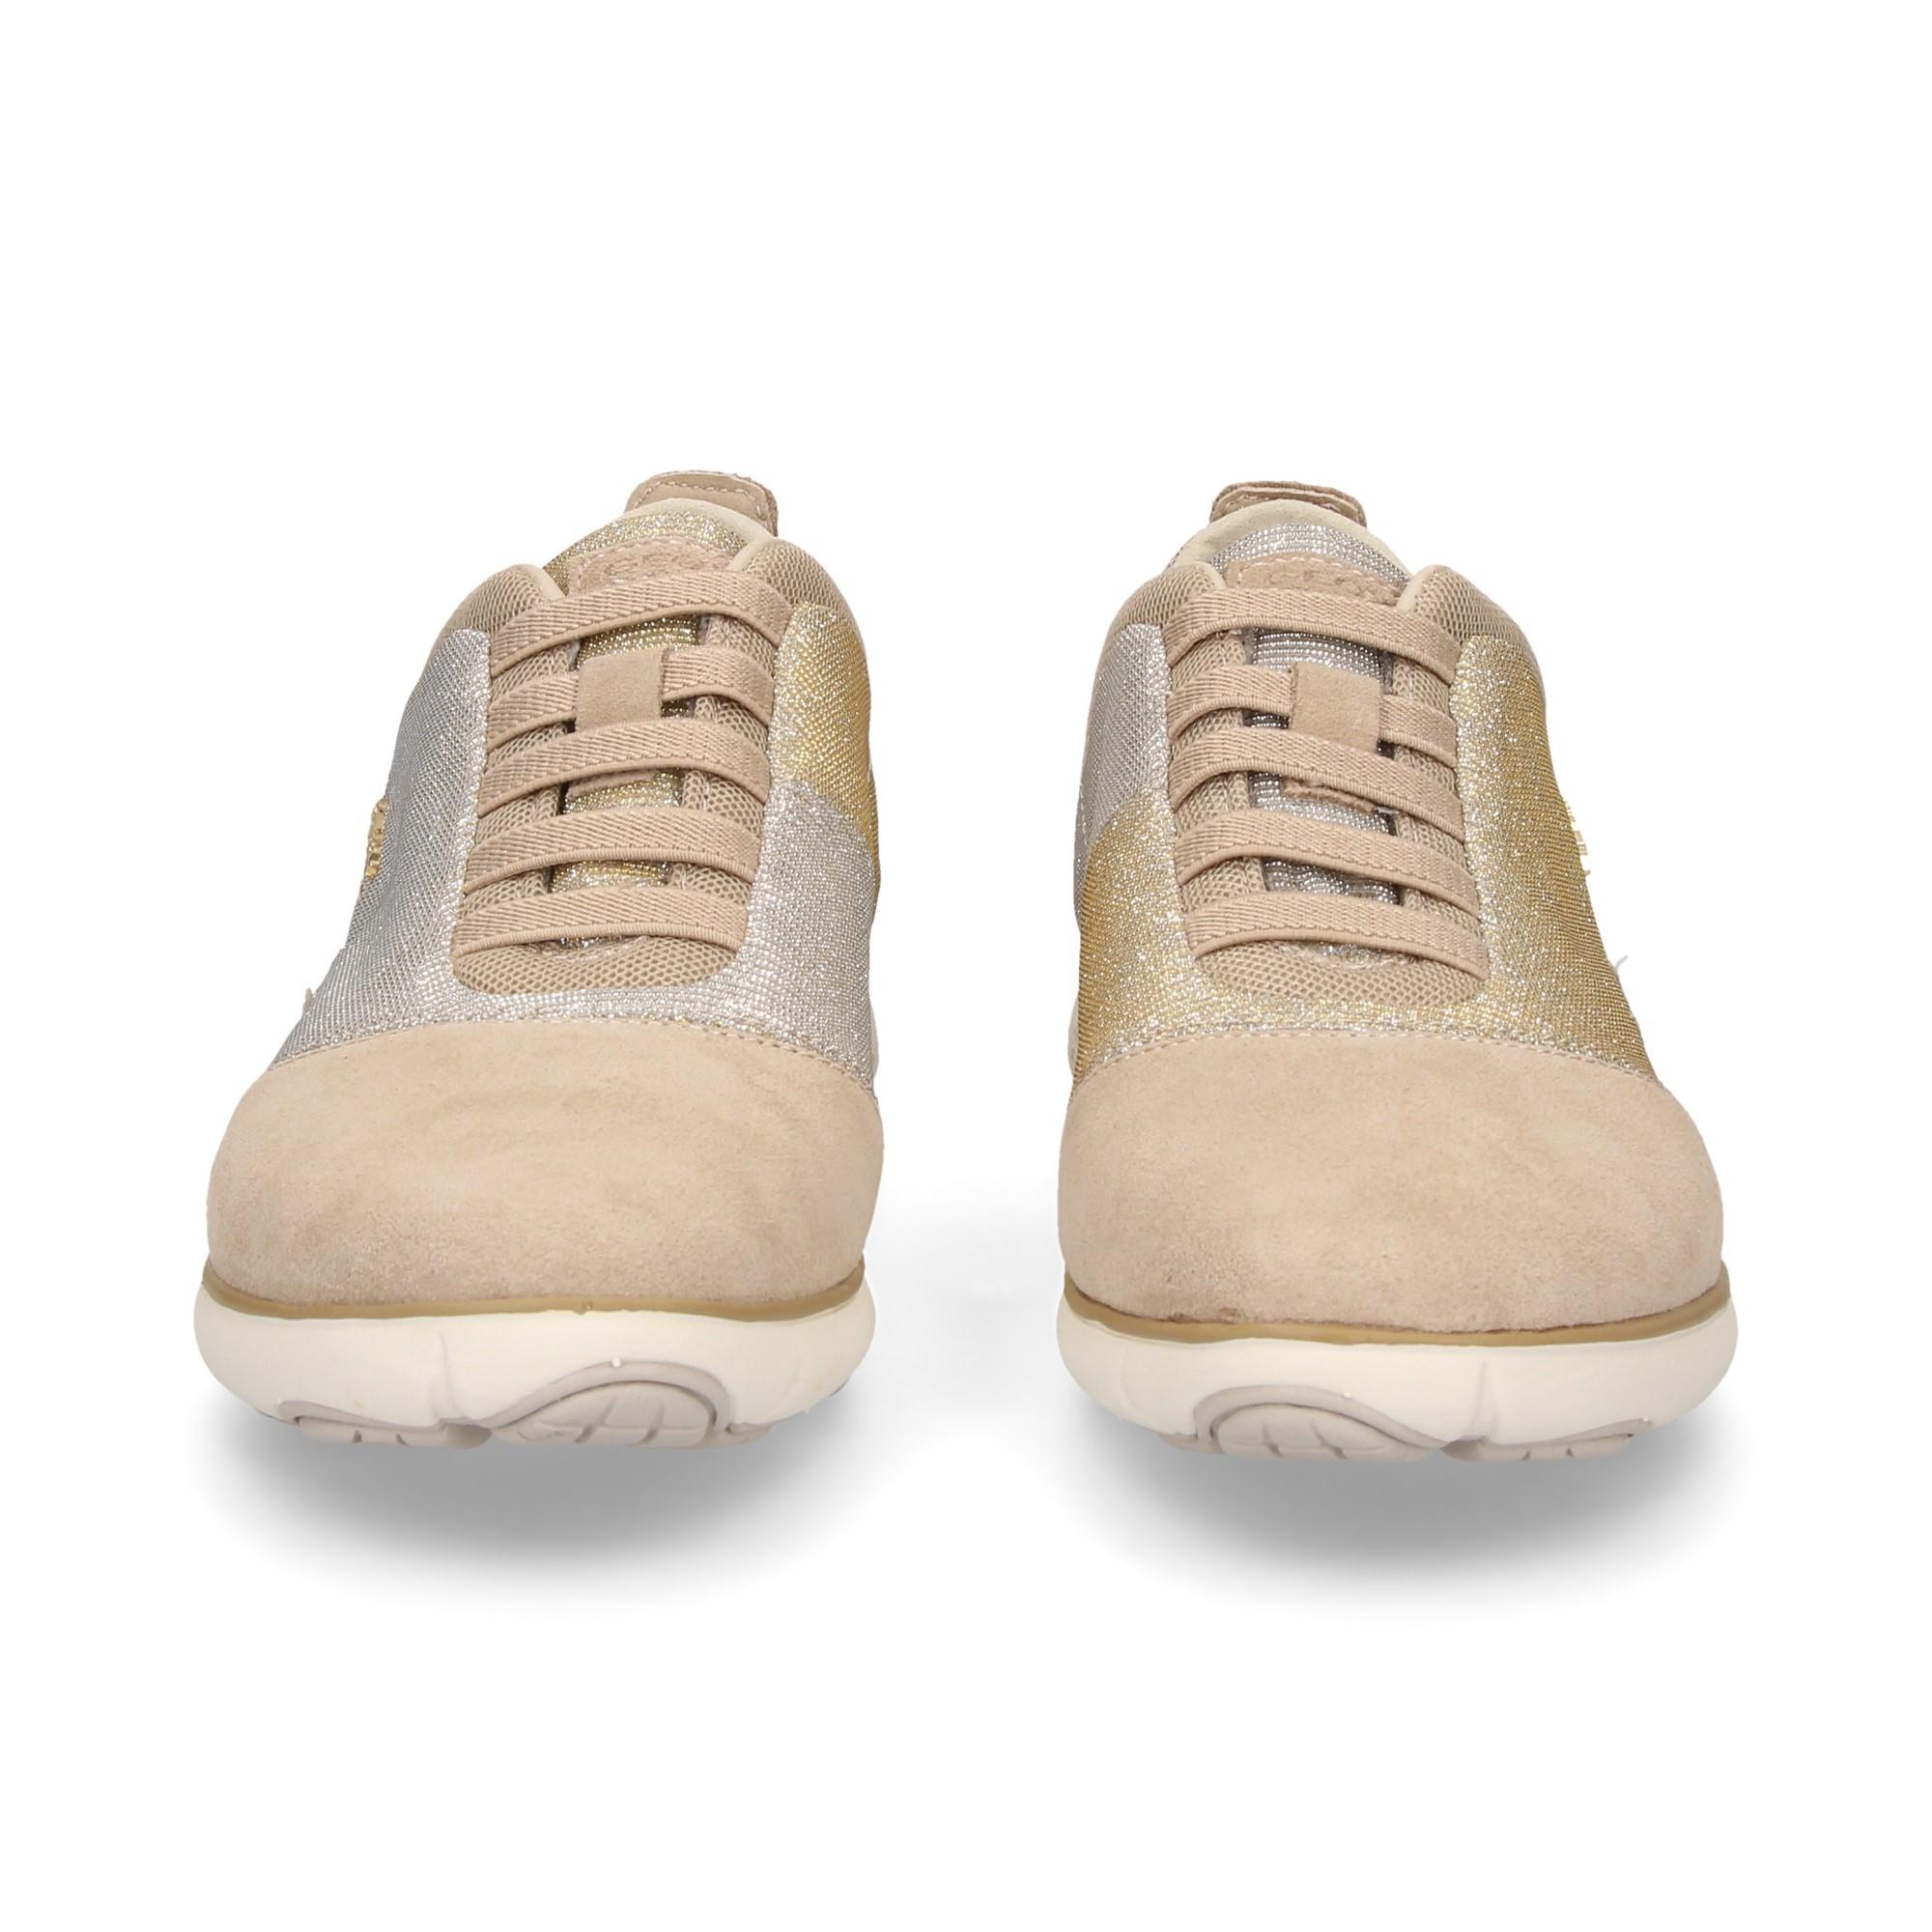 elasticos-nobuck-gliter-beige